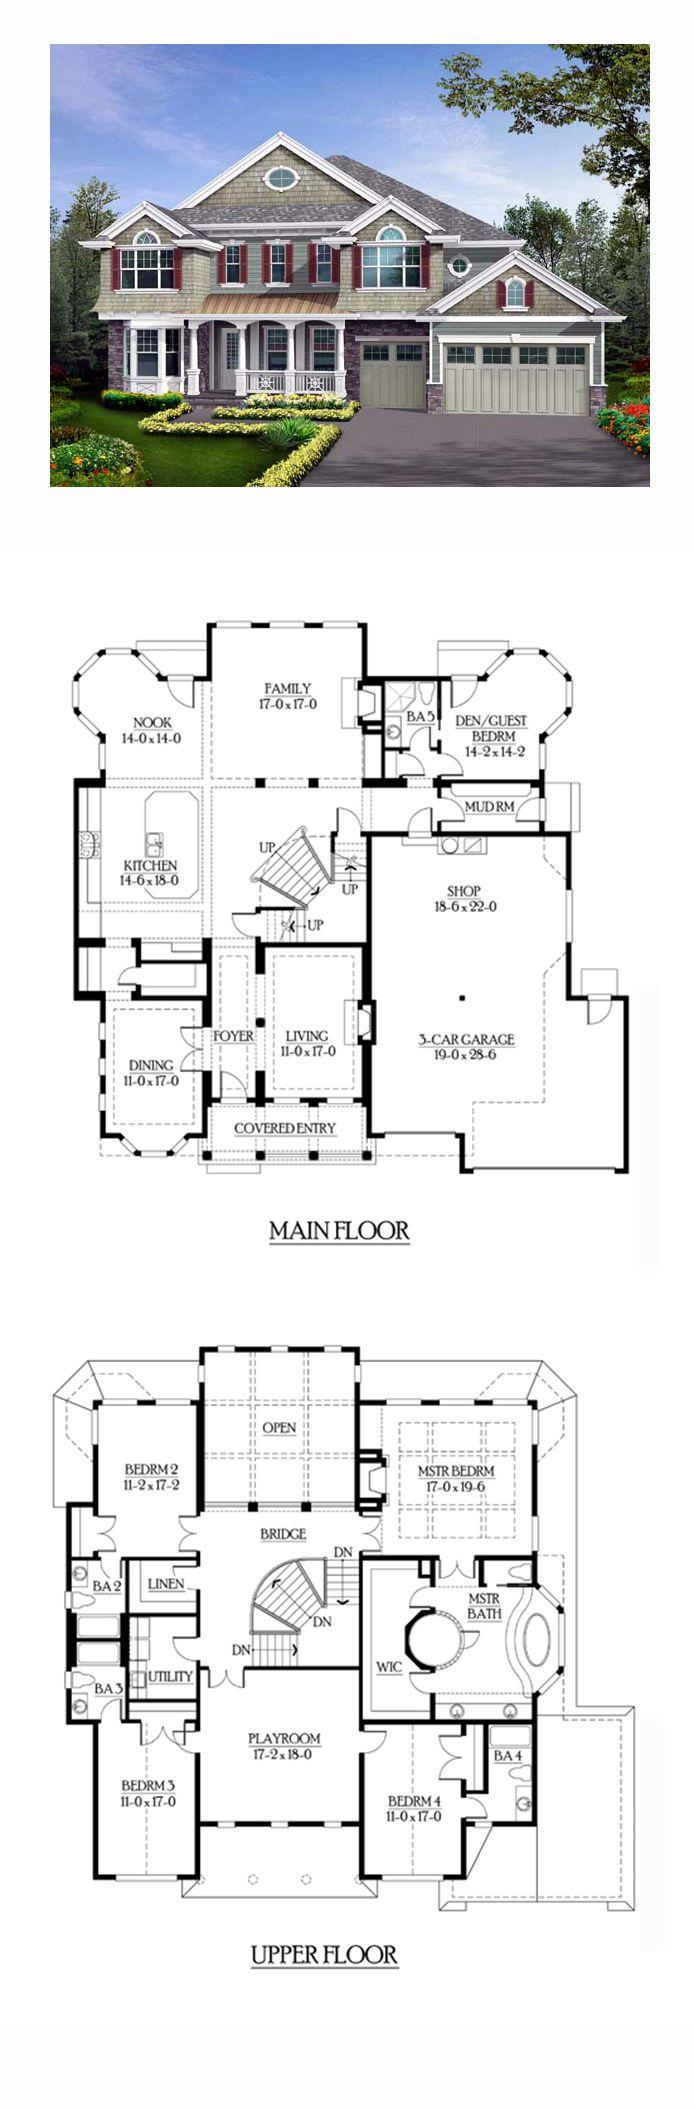 Fabulous 17 Best Ideas About House Blueprints On Pinterest House Floor Largest Home Design Picture Inspirations Pitcheantrous